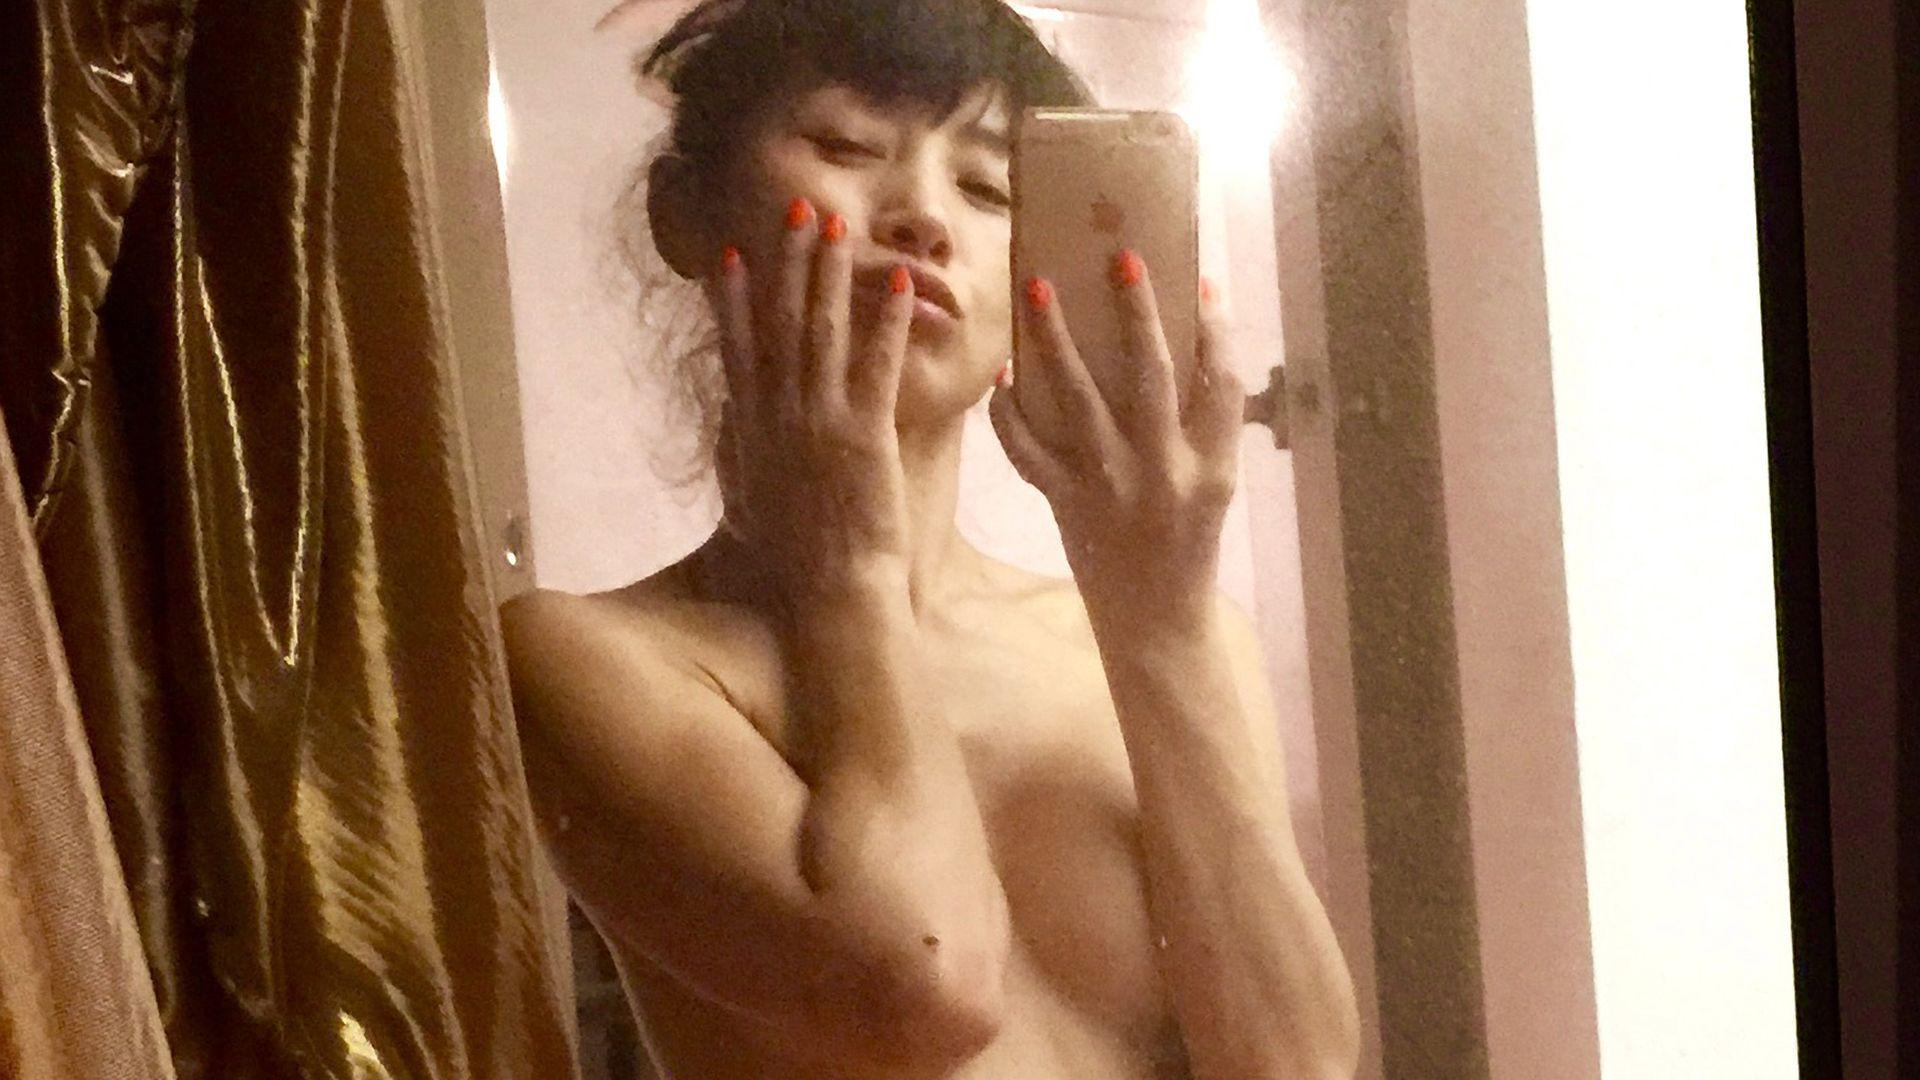 Bai Ling nackt, Oben ohne Bilder, Playboy Fotos, Sex Szene